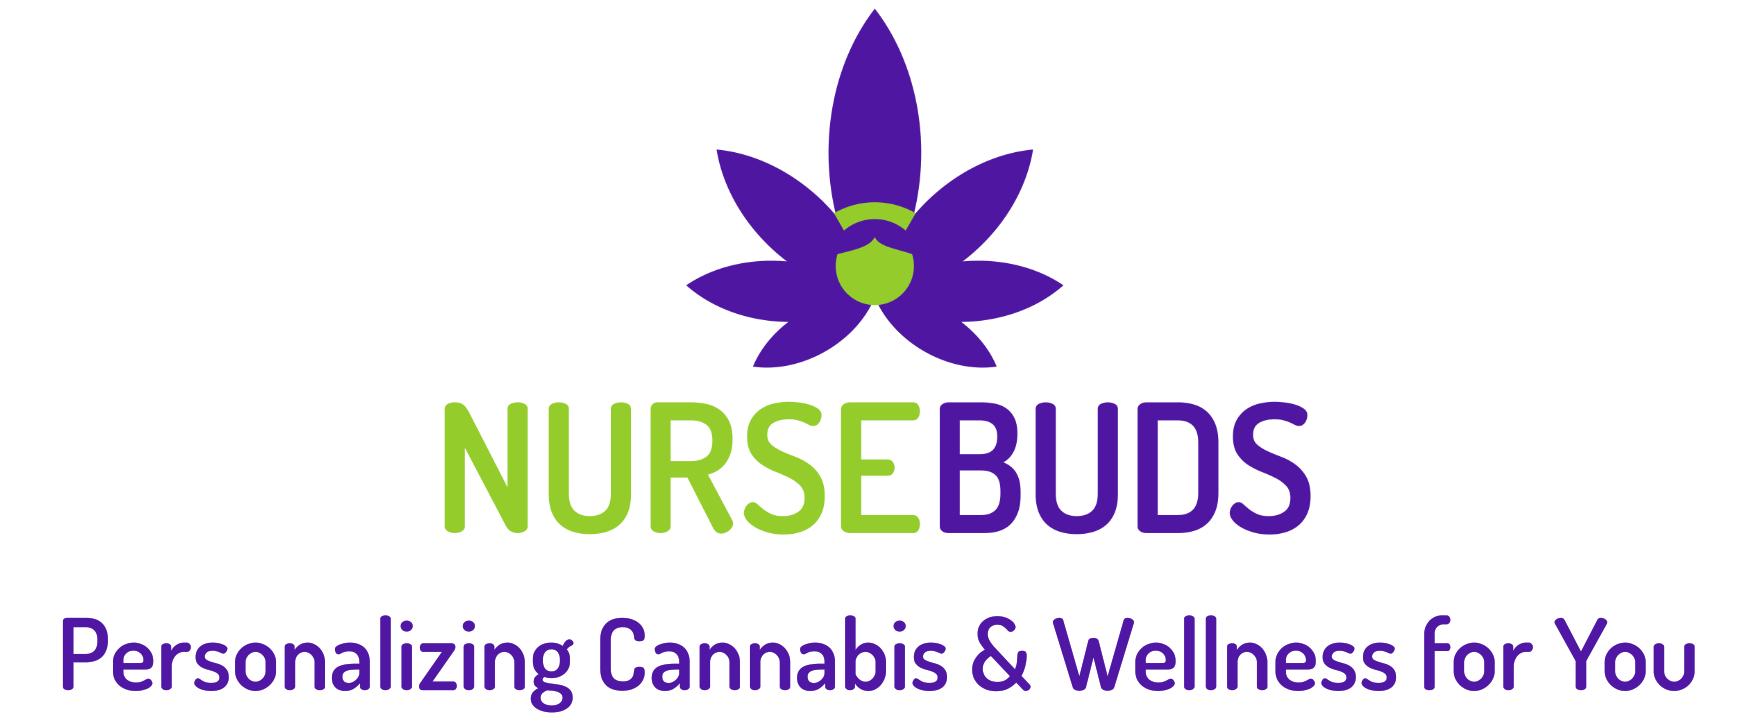 Nursebuds